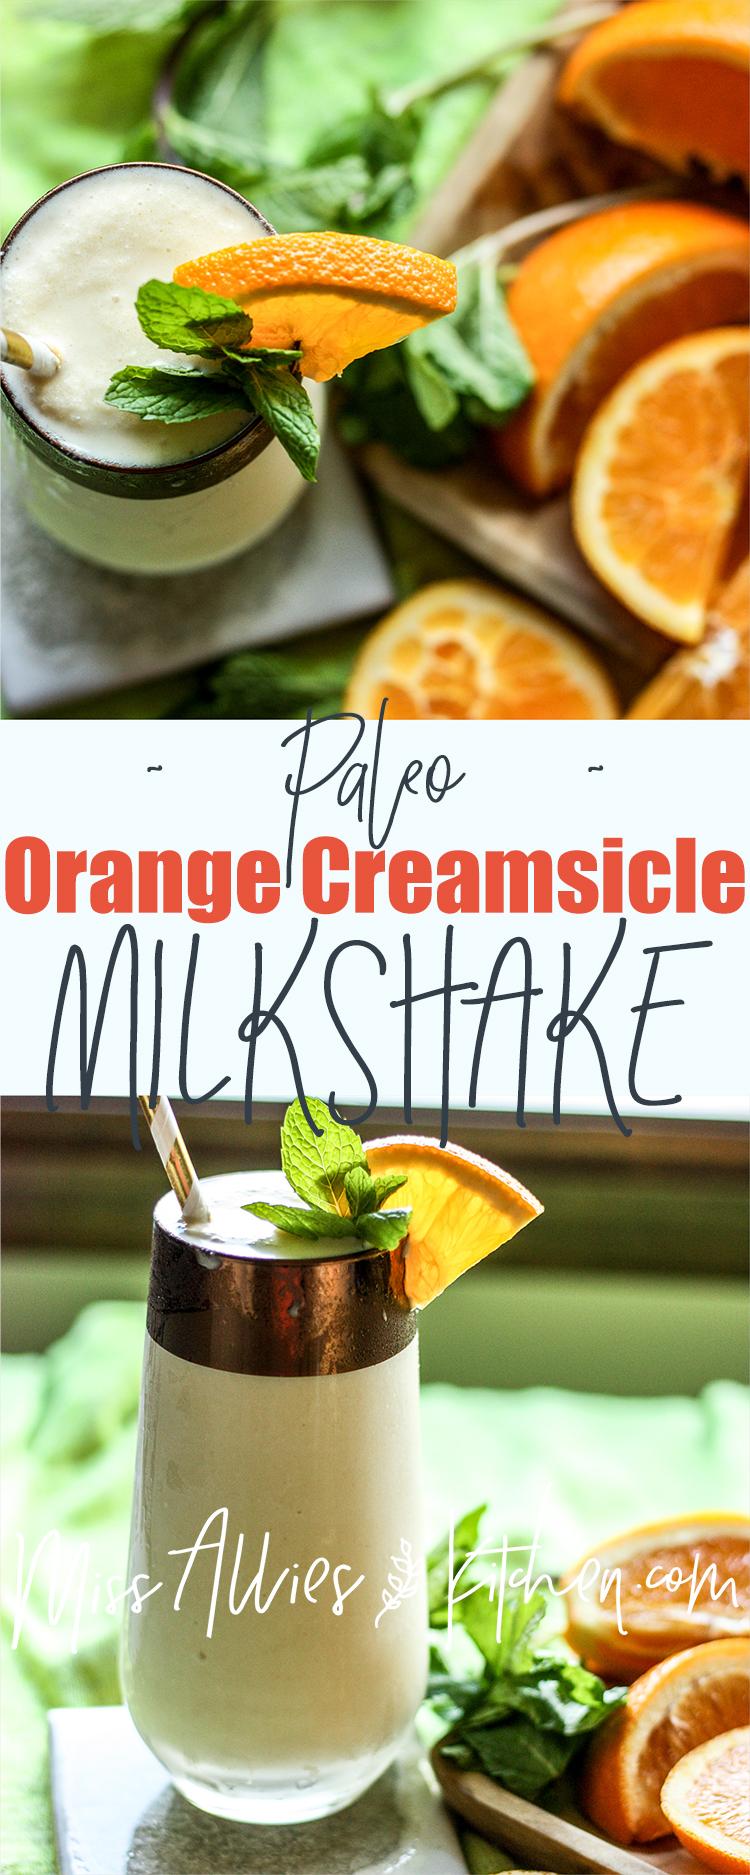 Paleo Orange Creamsicle Milkshake with Turmeric